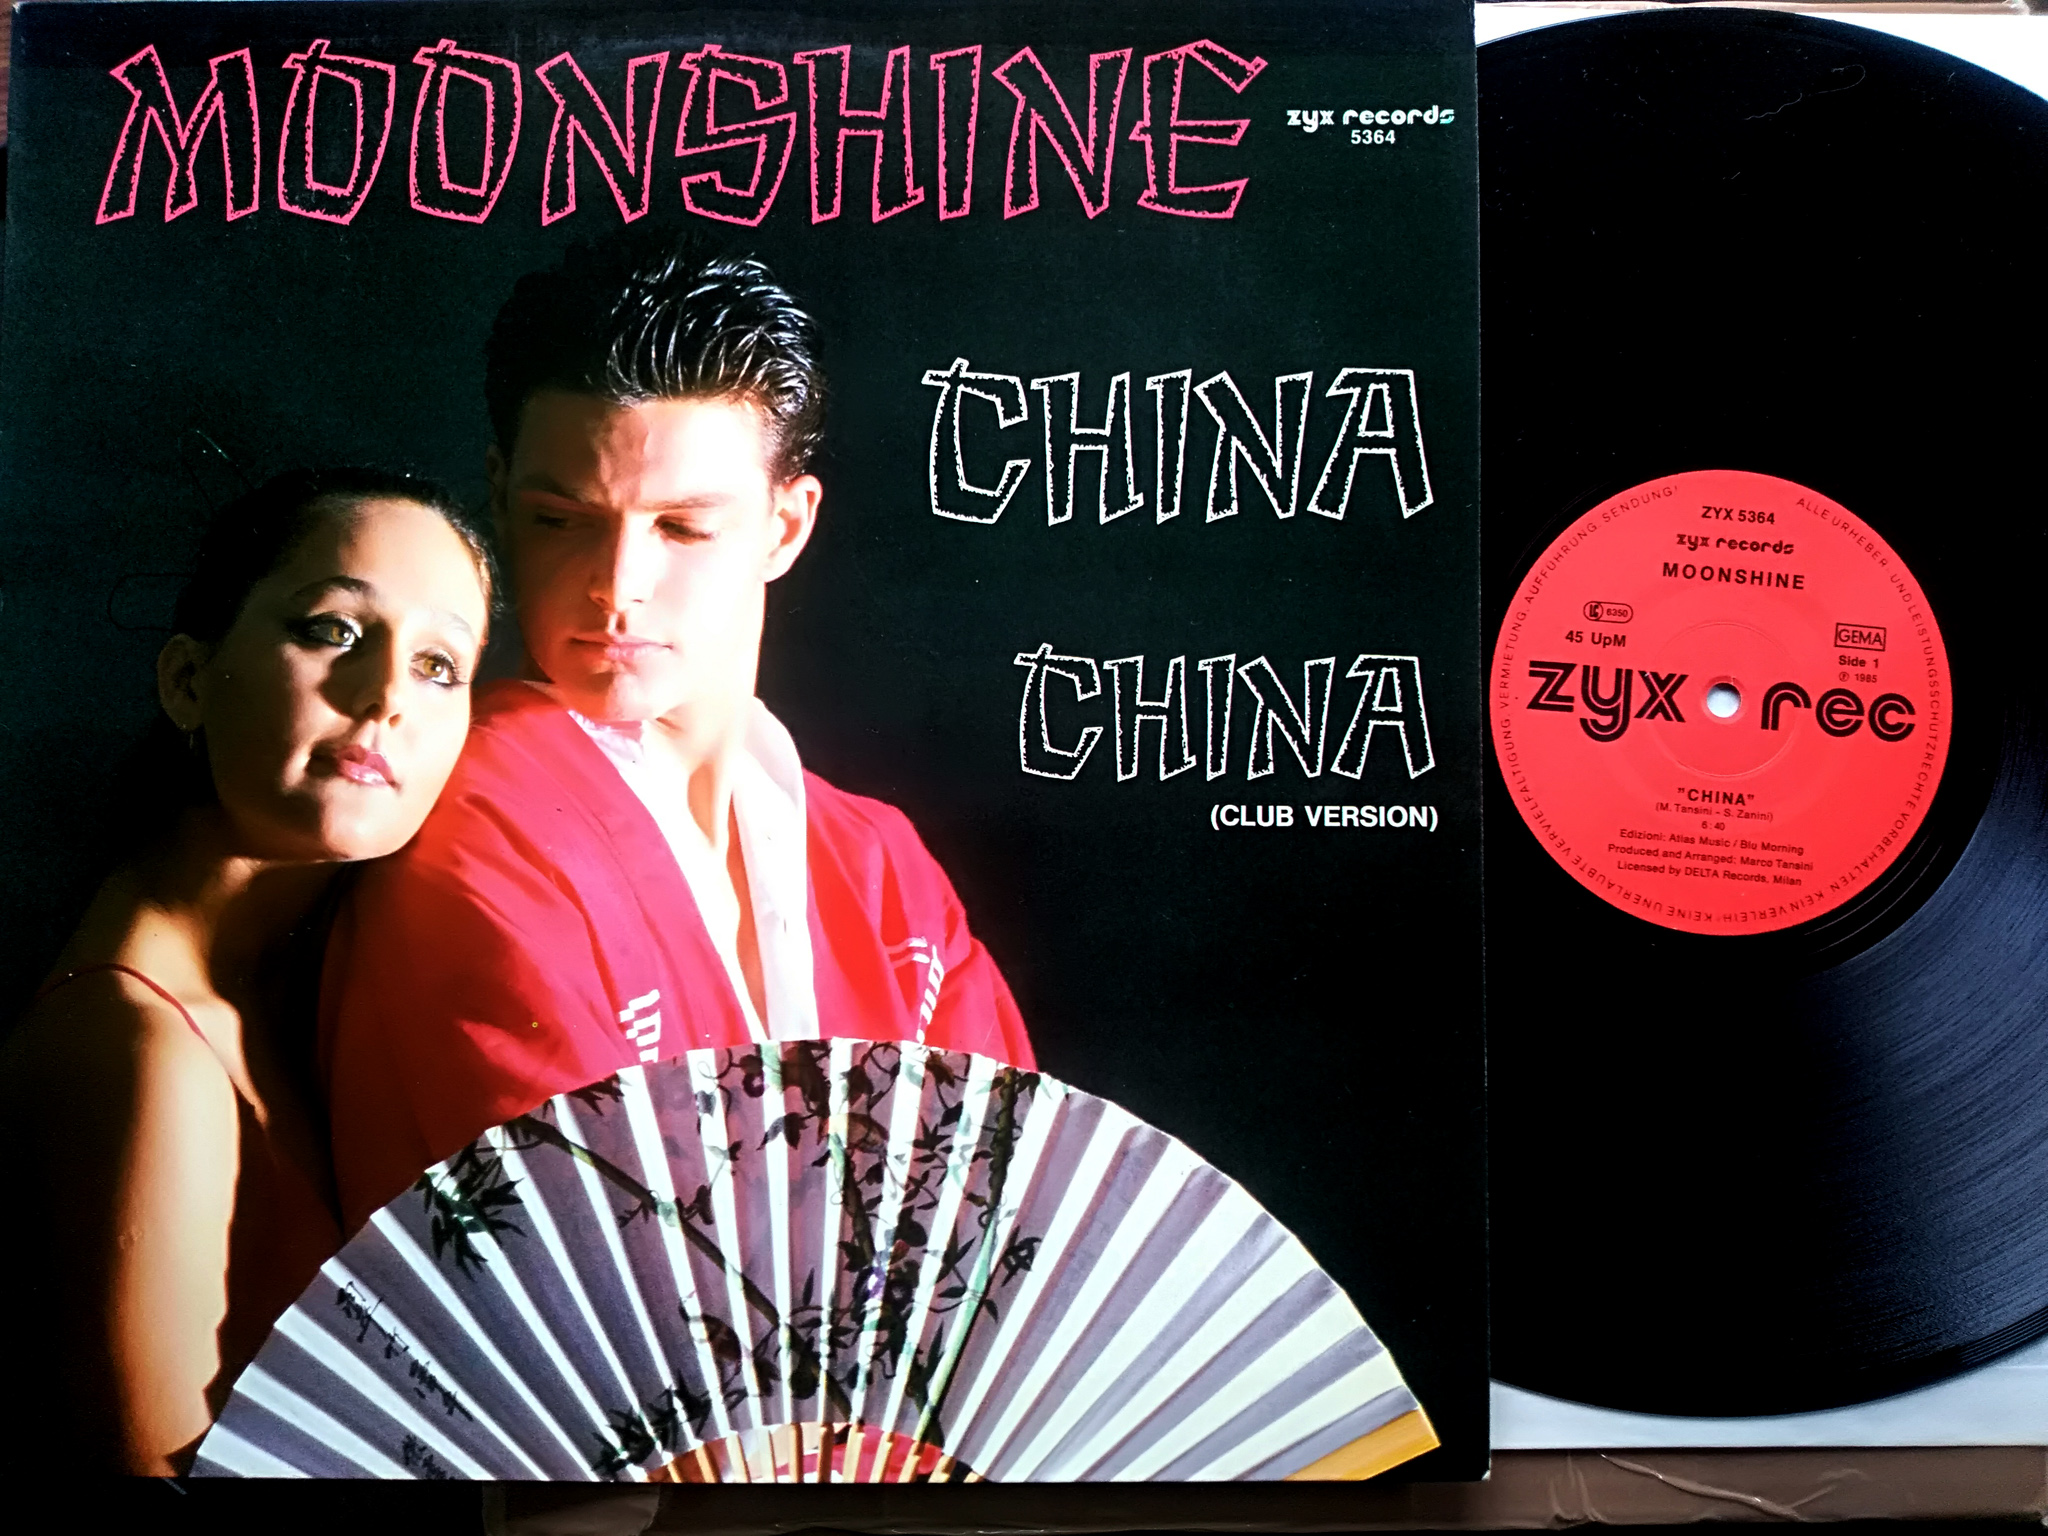 Moonshine - China